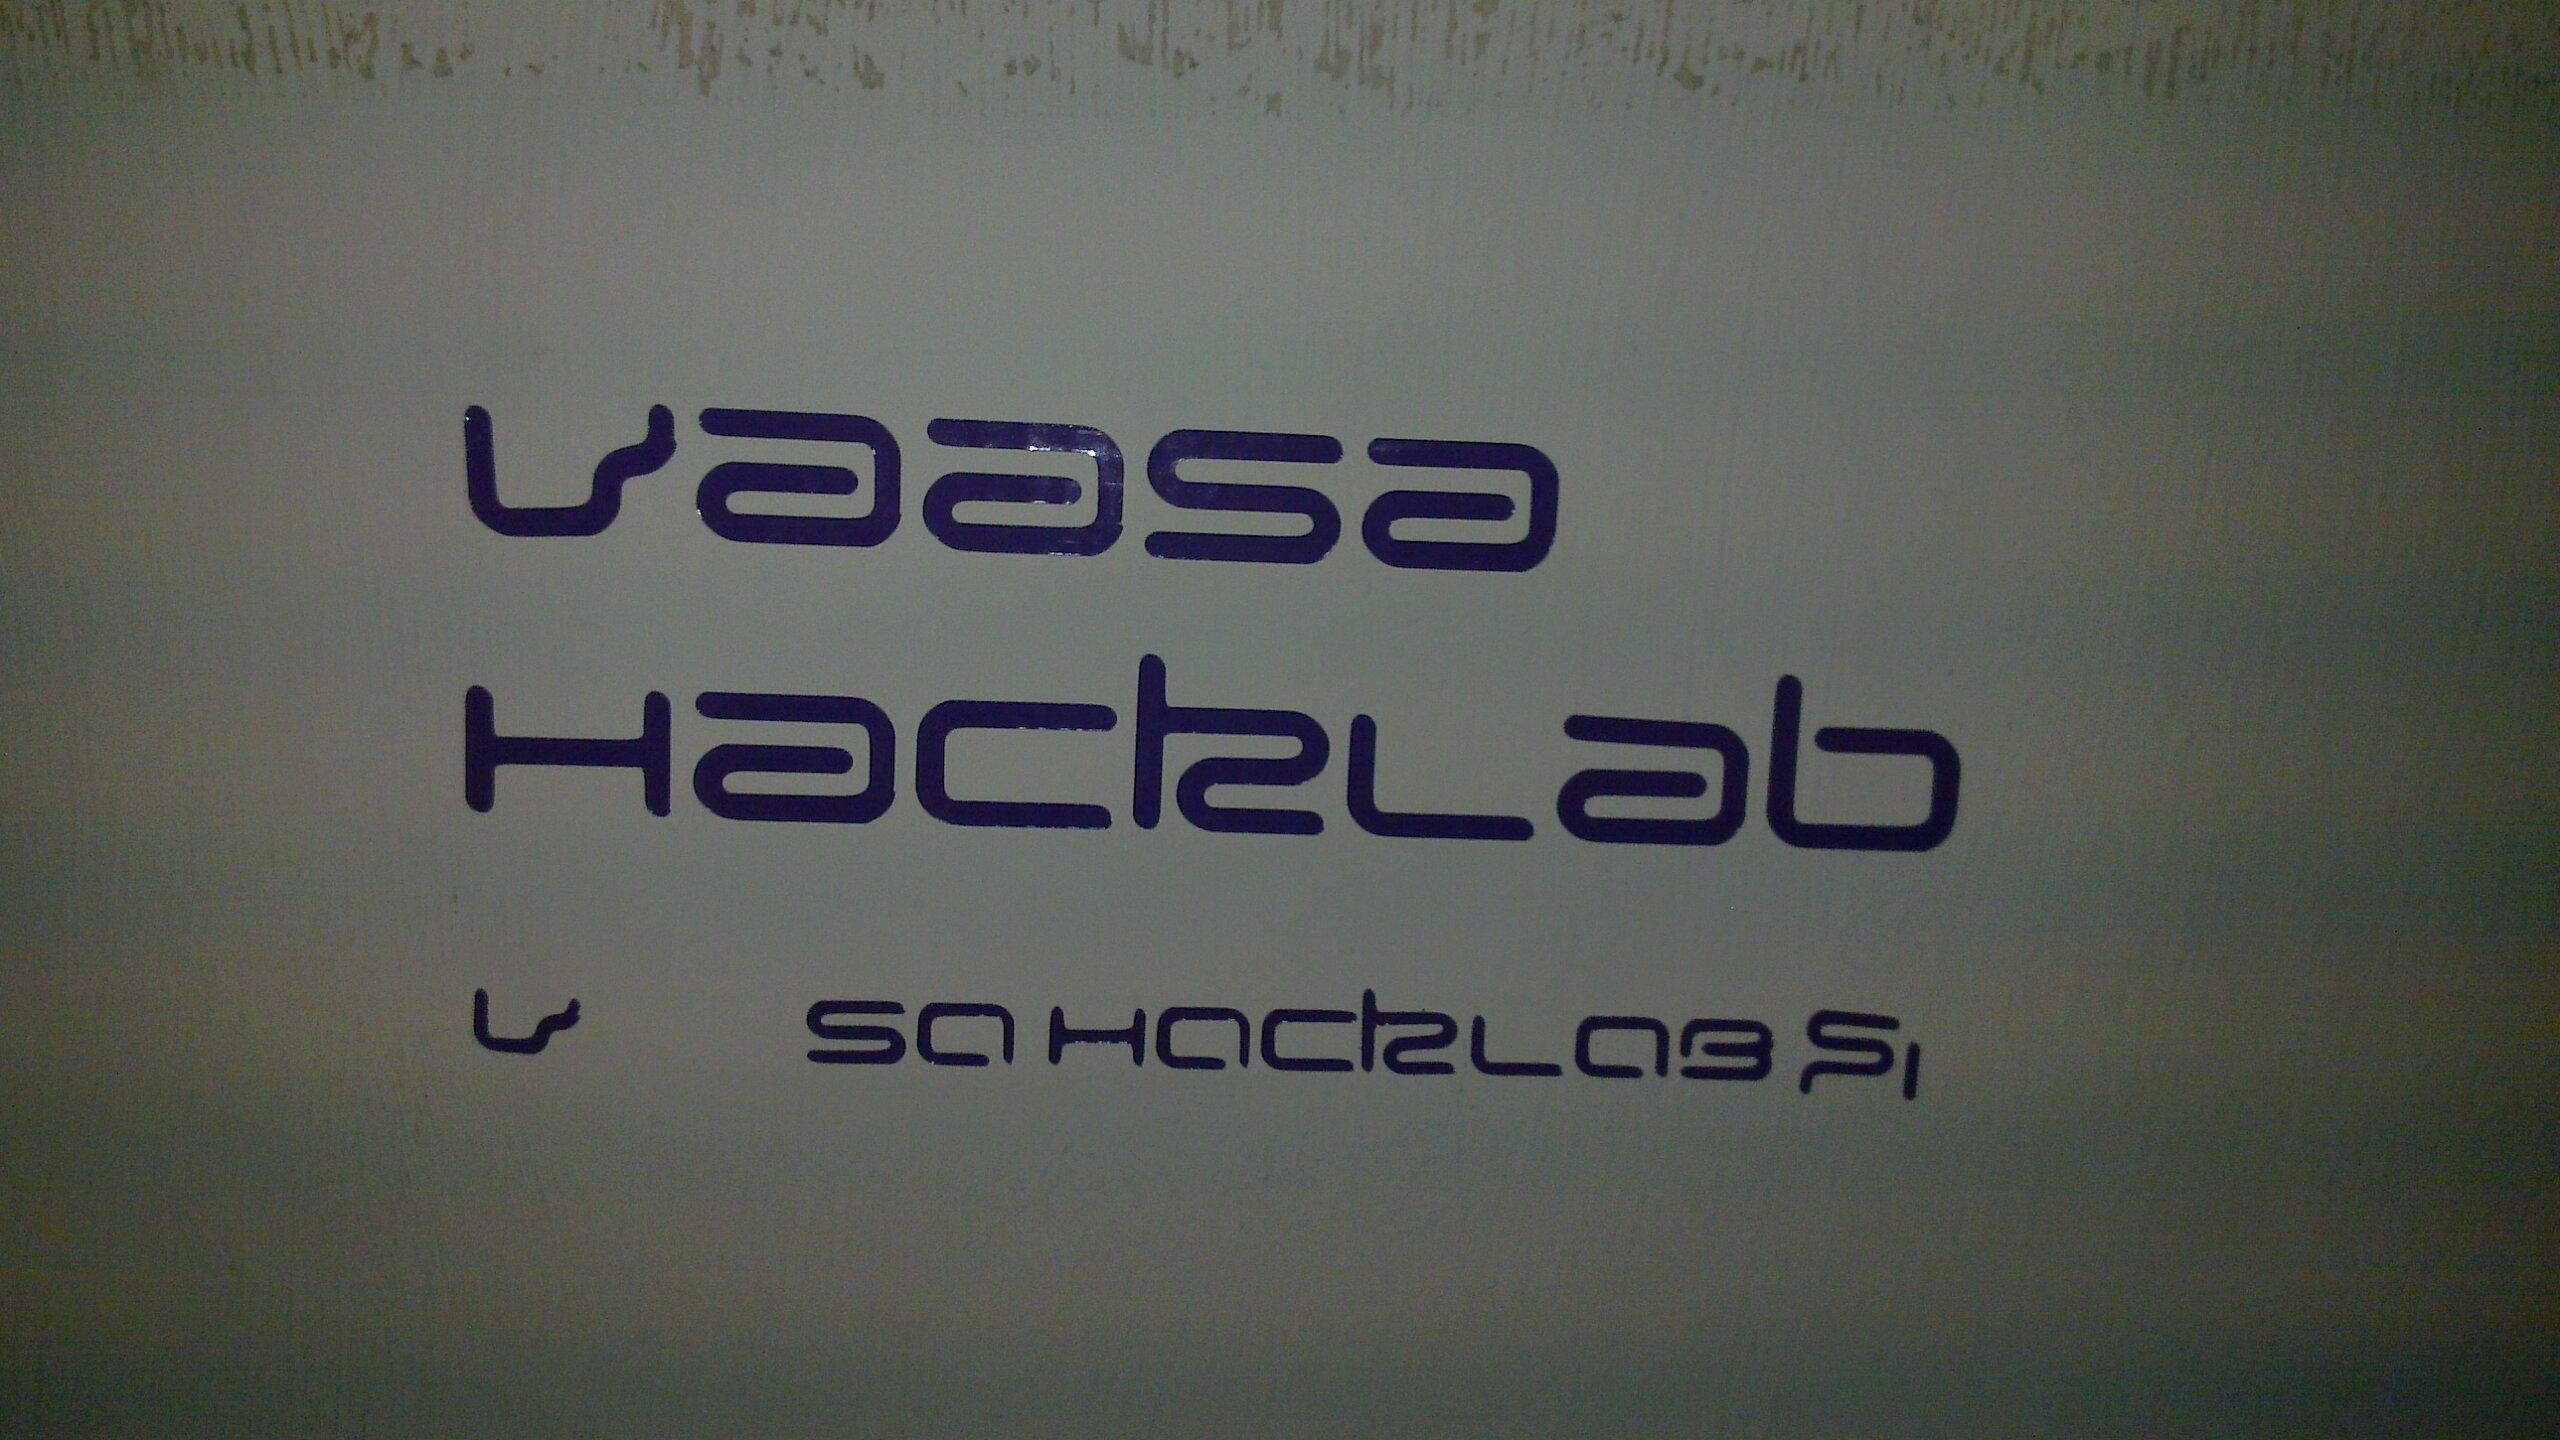 Vinyl cut Vaasa Hacklab